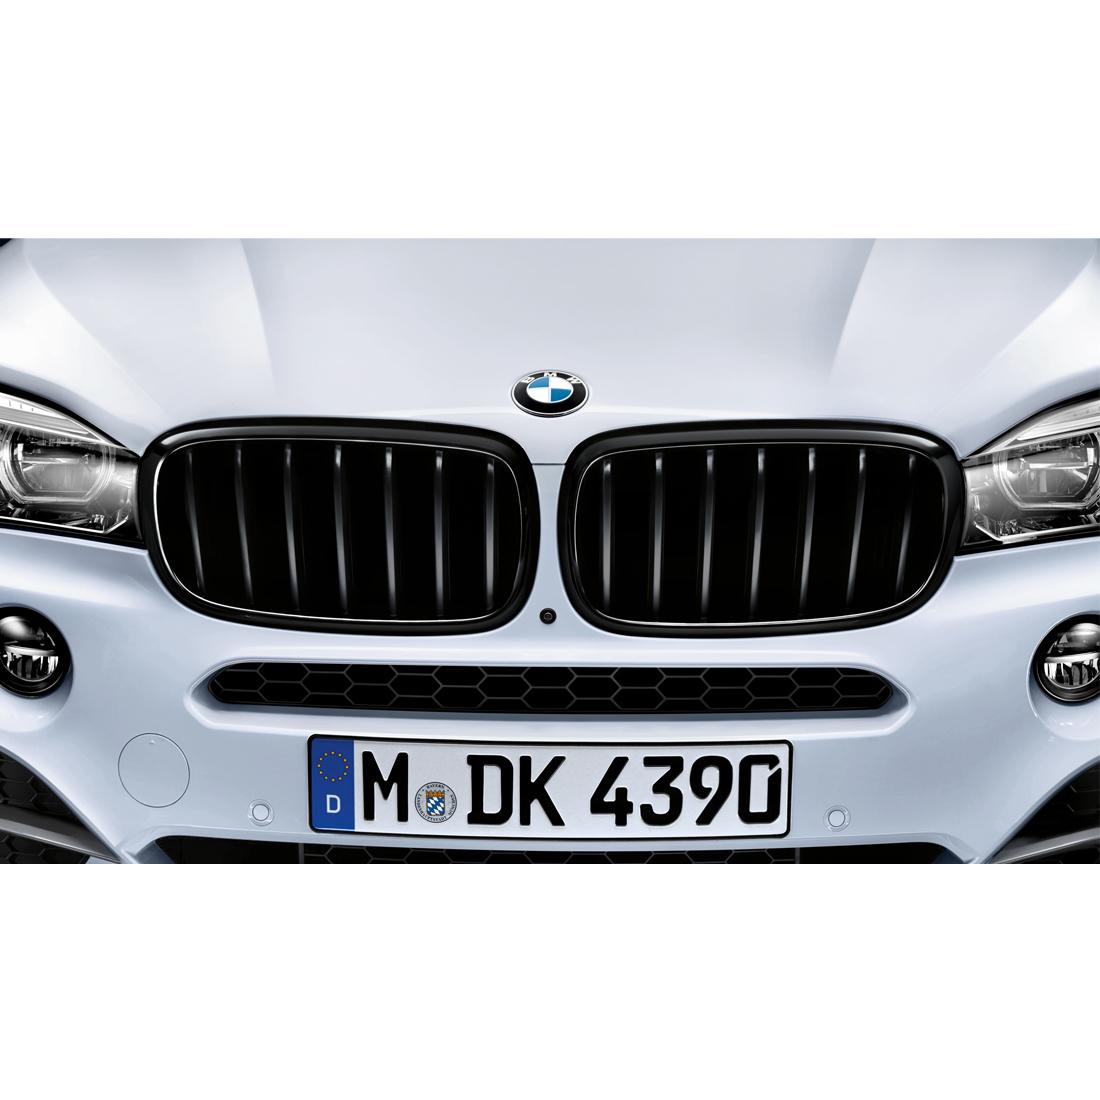 Bmw Years: ShopBMWUSA.com: BMW M PERFORMANCE BLACK KIDNEY GRILLES FOR X5